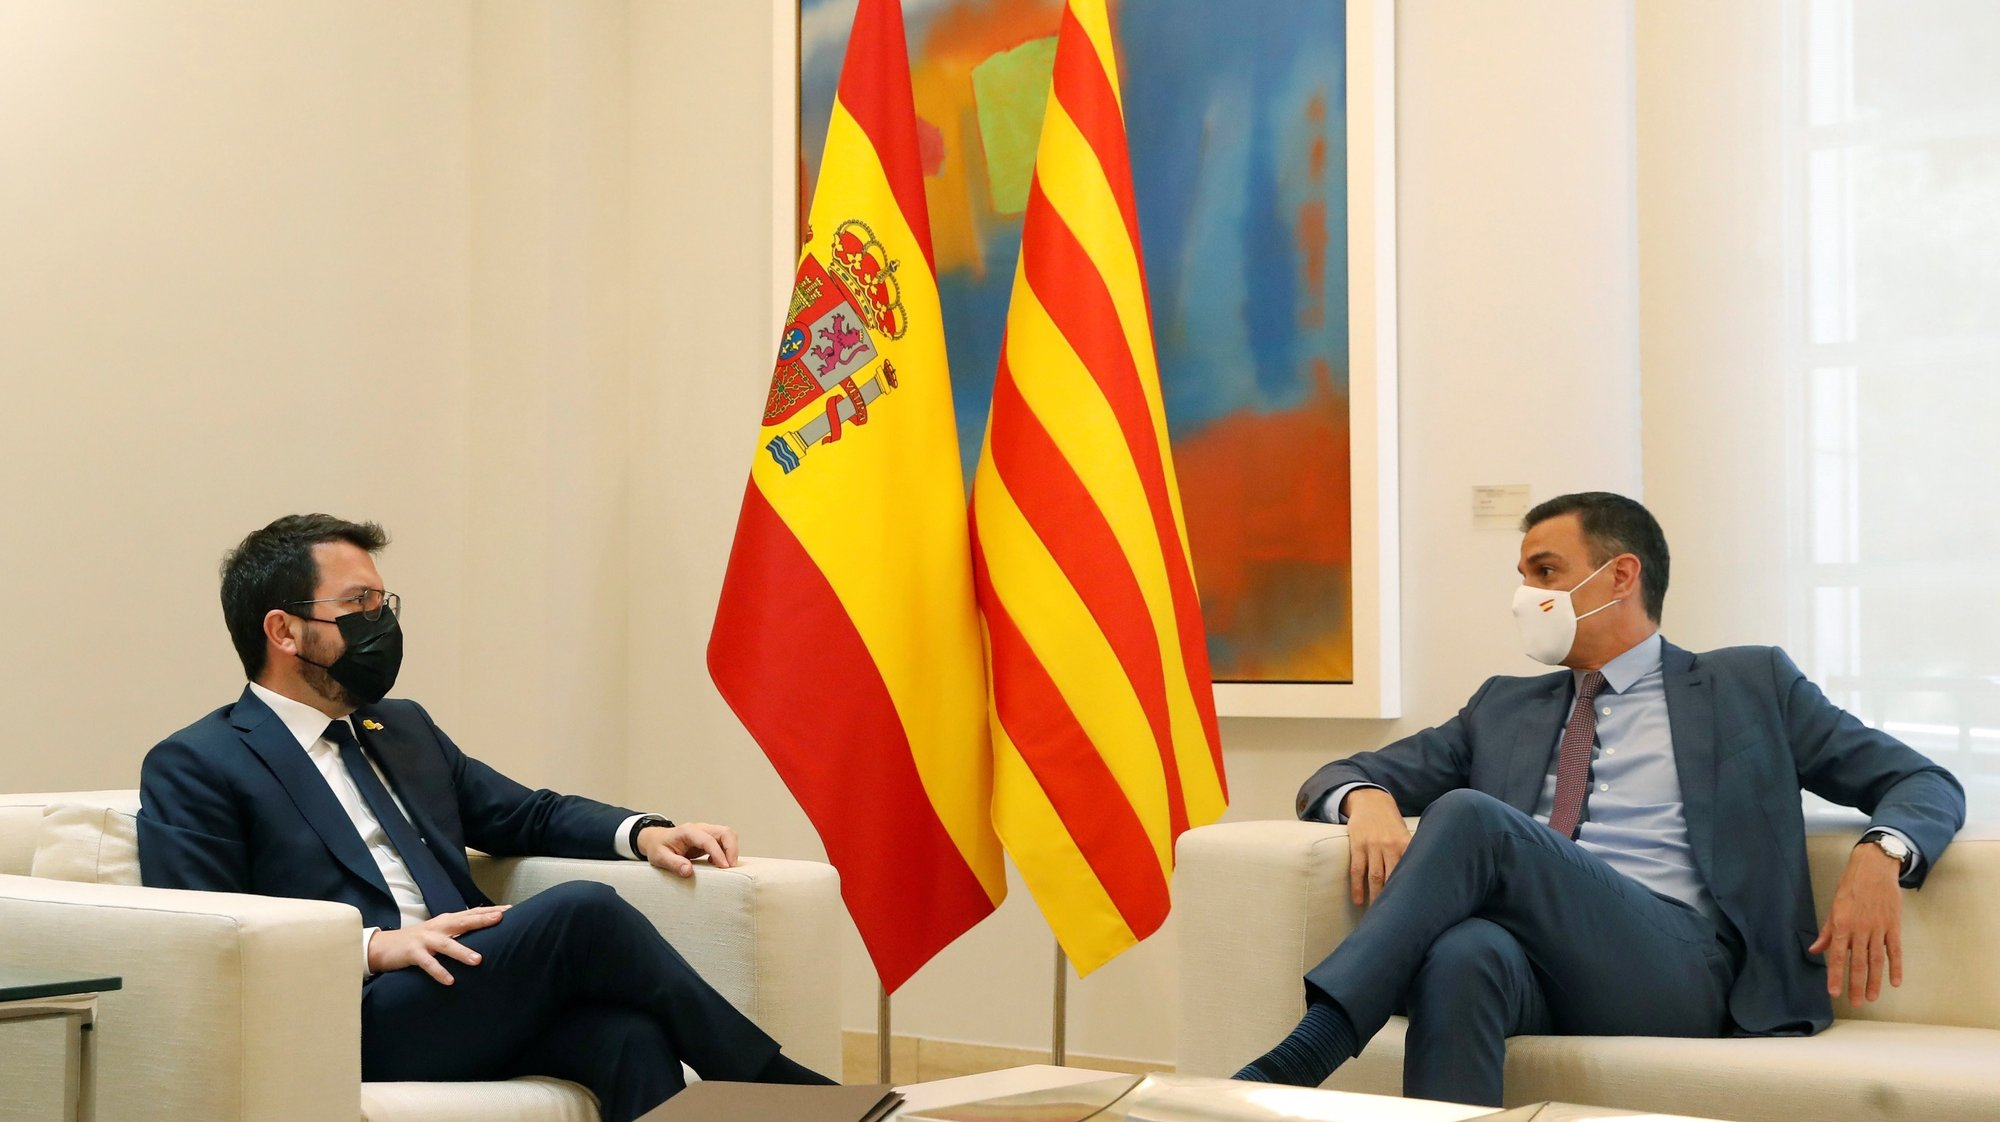 epa09311087 Spanish Prime Minister, Pedro Sanchez (R), receives Catalonia's regional president, Pere Aragones (L), during a meeting held at Moncloa Palace in Madrid, Spain, 29 June 2021.  EPA/Juan Carlos Hidalgo